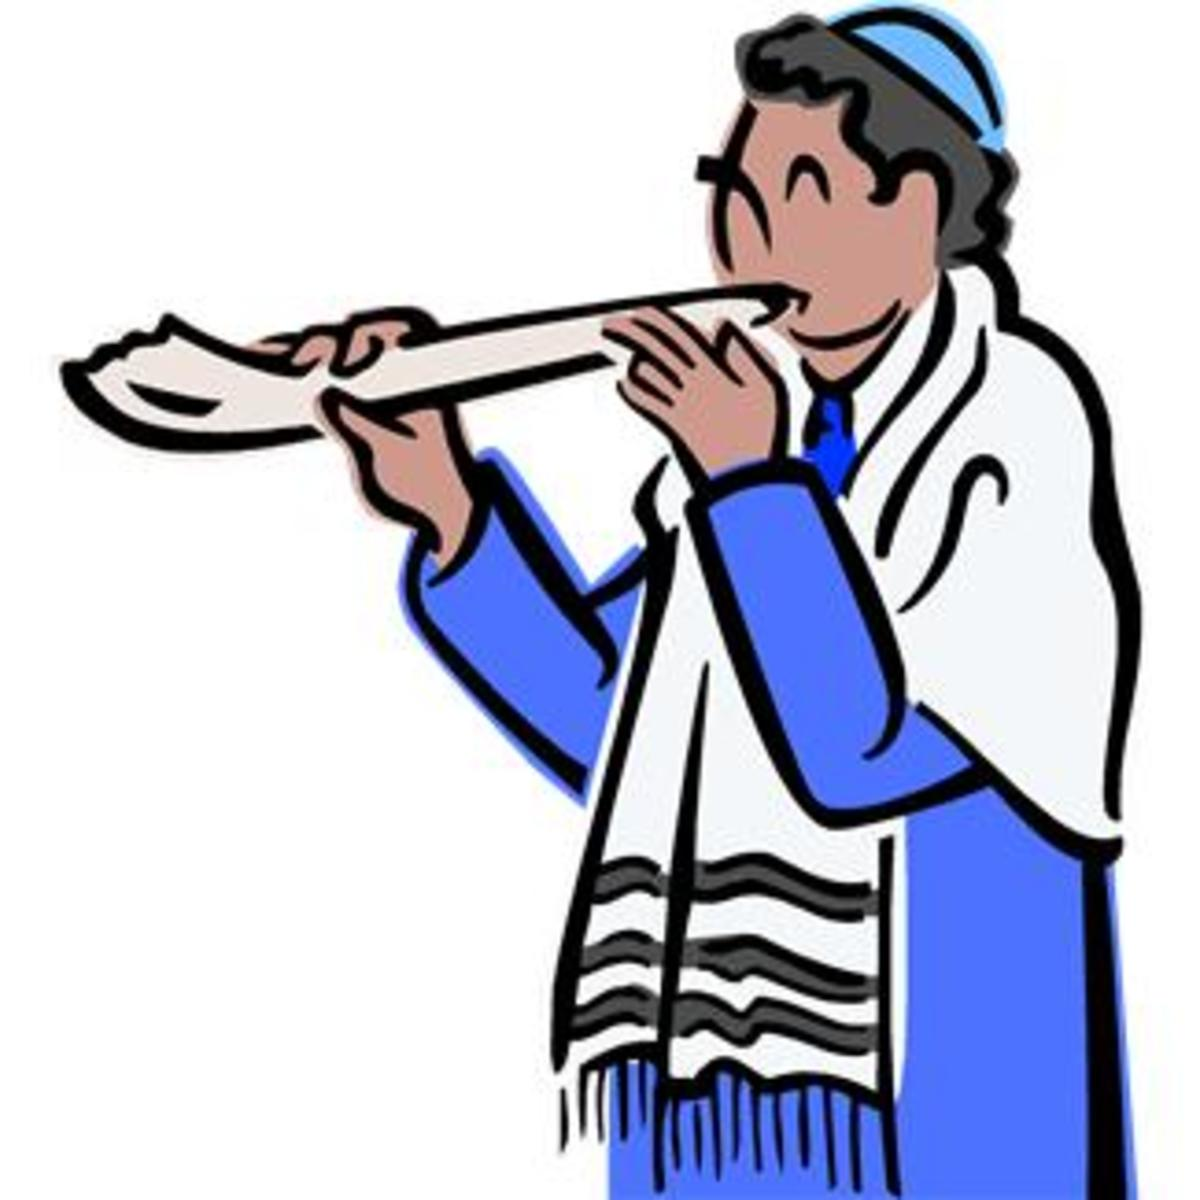 Blowing the Shofar at Rosh Hashanah Service